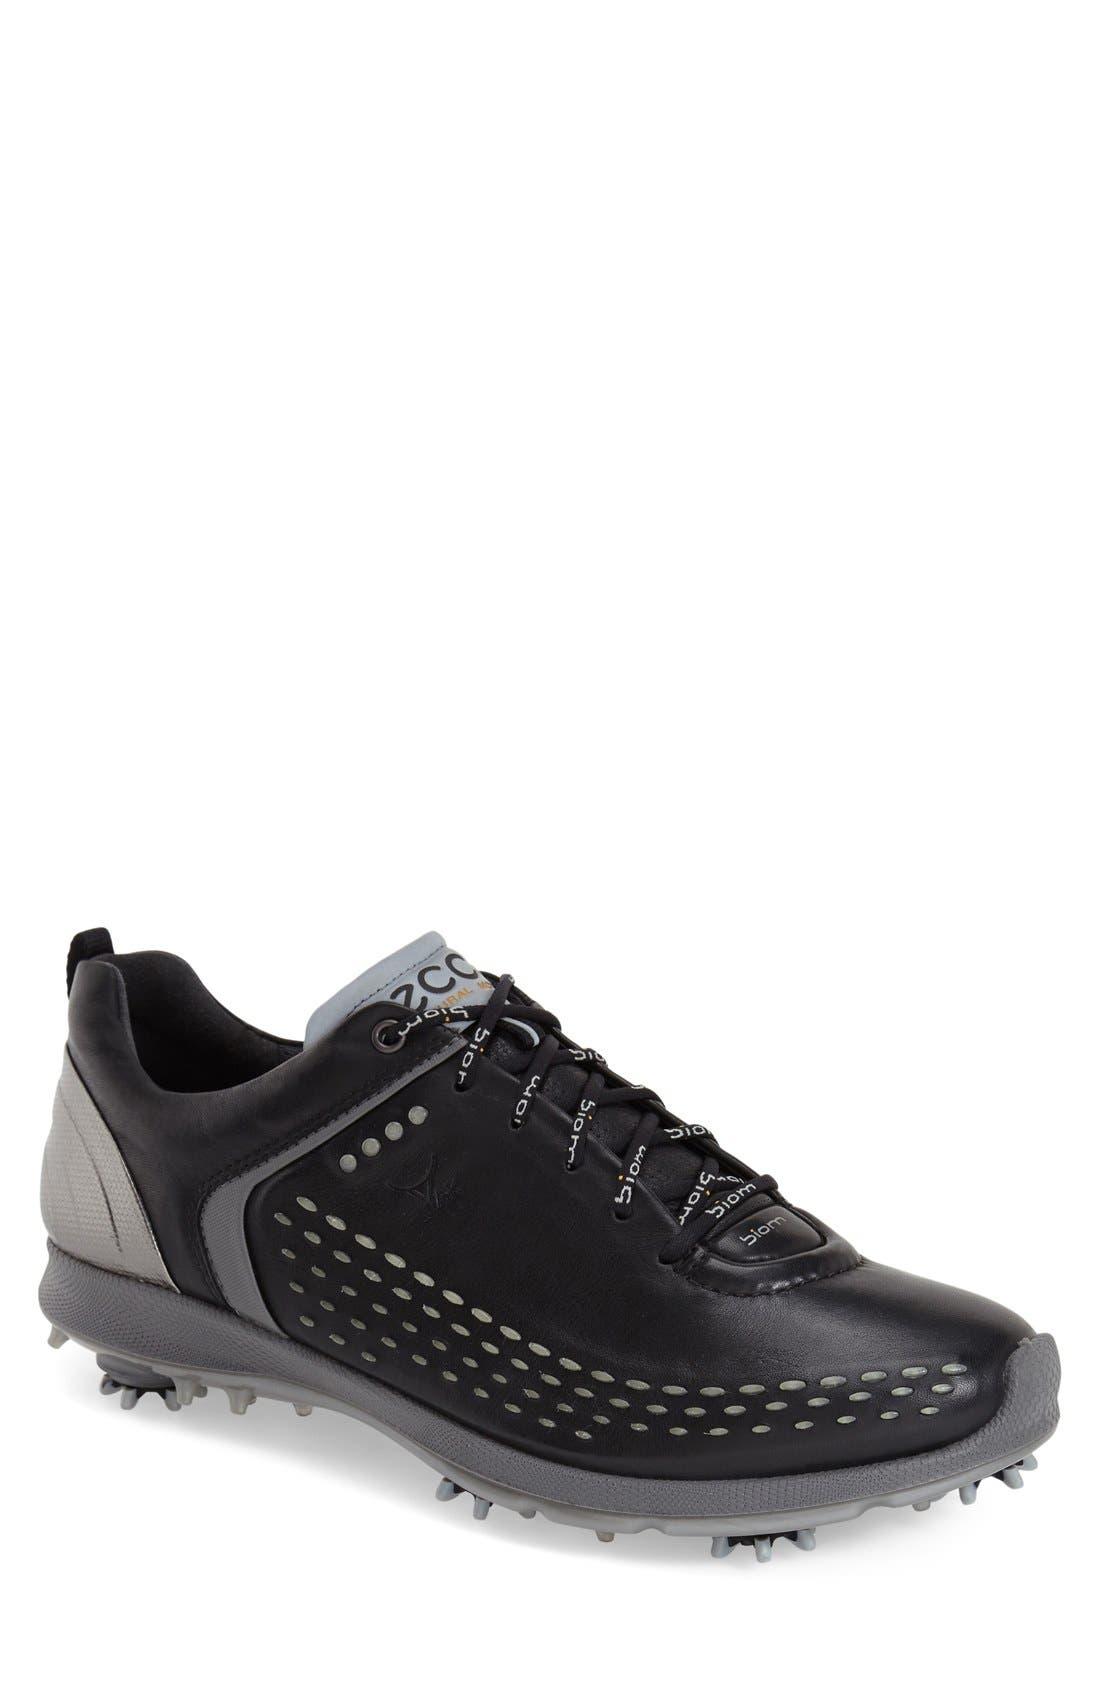 BIOM Hydromax Waterproof Golf Shoe,                             Main thumbnail 1, color,                             Black/ Transparent